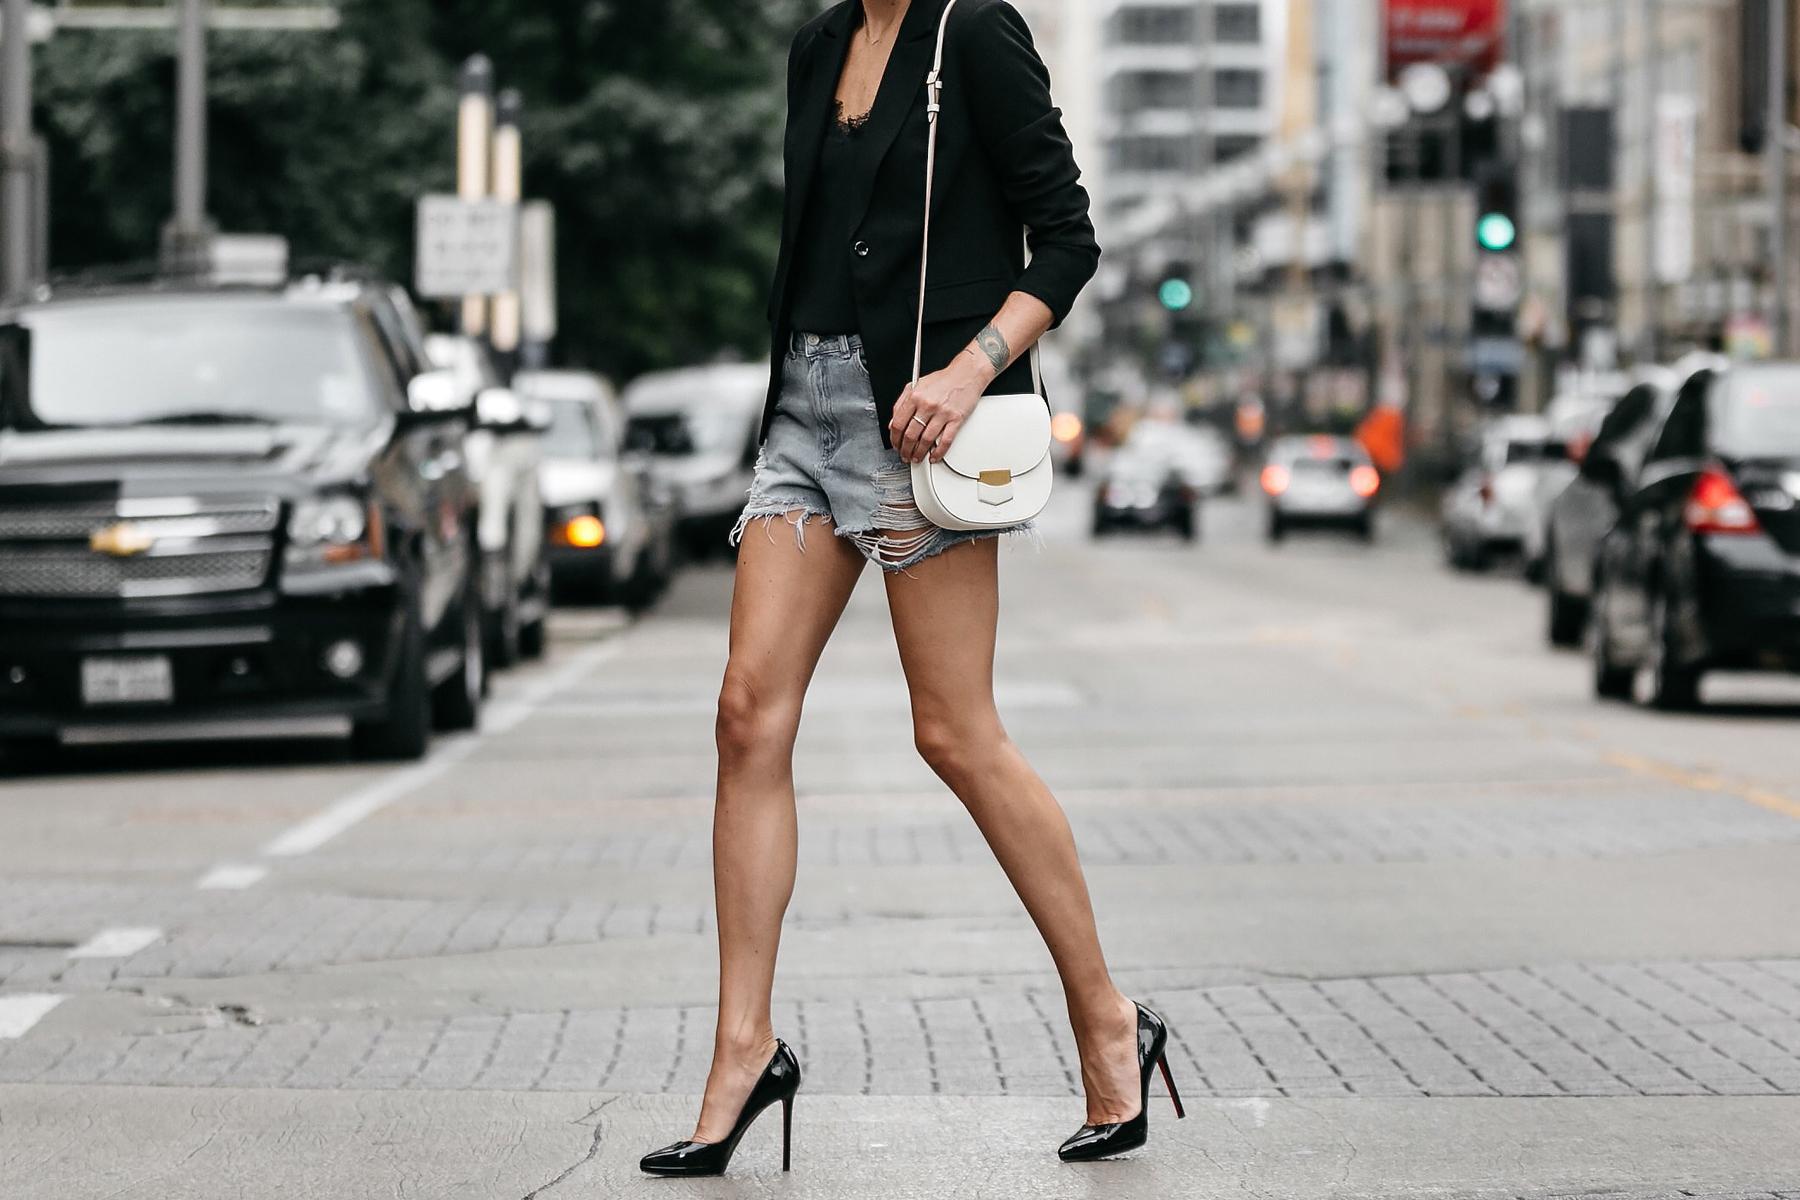 Nordstrom Black Blazer Topshop Denim Cutoff Shorts Outfit Christian Louboutin Black Pumps Celine White Trotteur Handbag Street Style Dallas Blogger Fashion Blogger